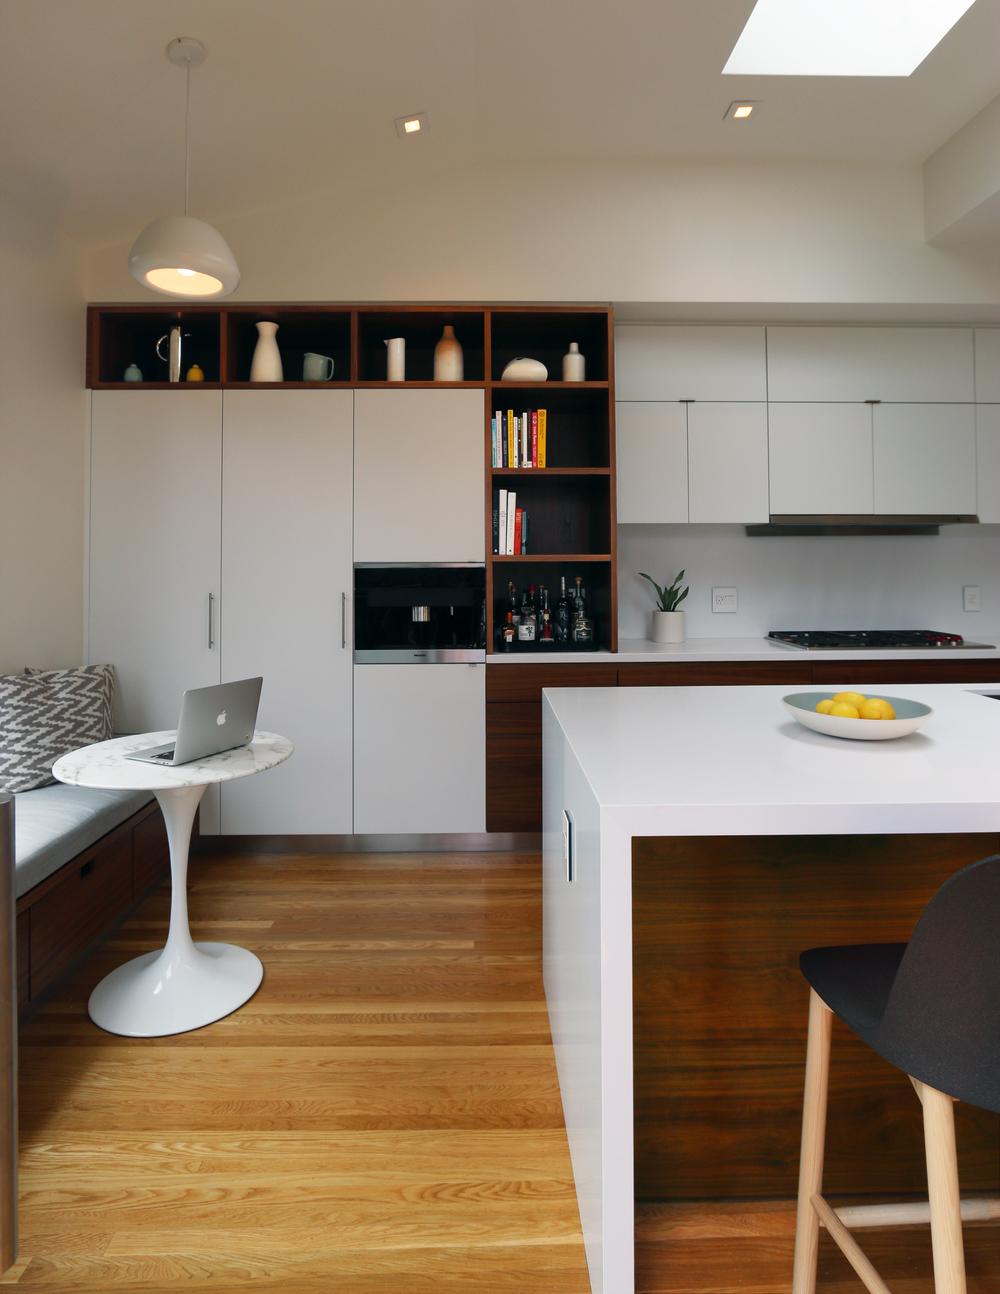 eta_kitchen.jpg